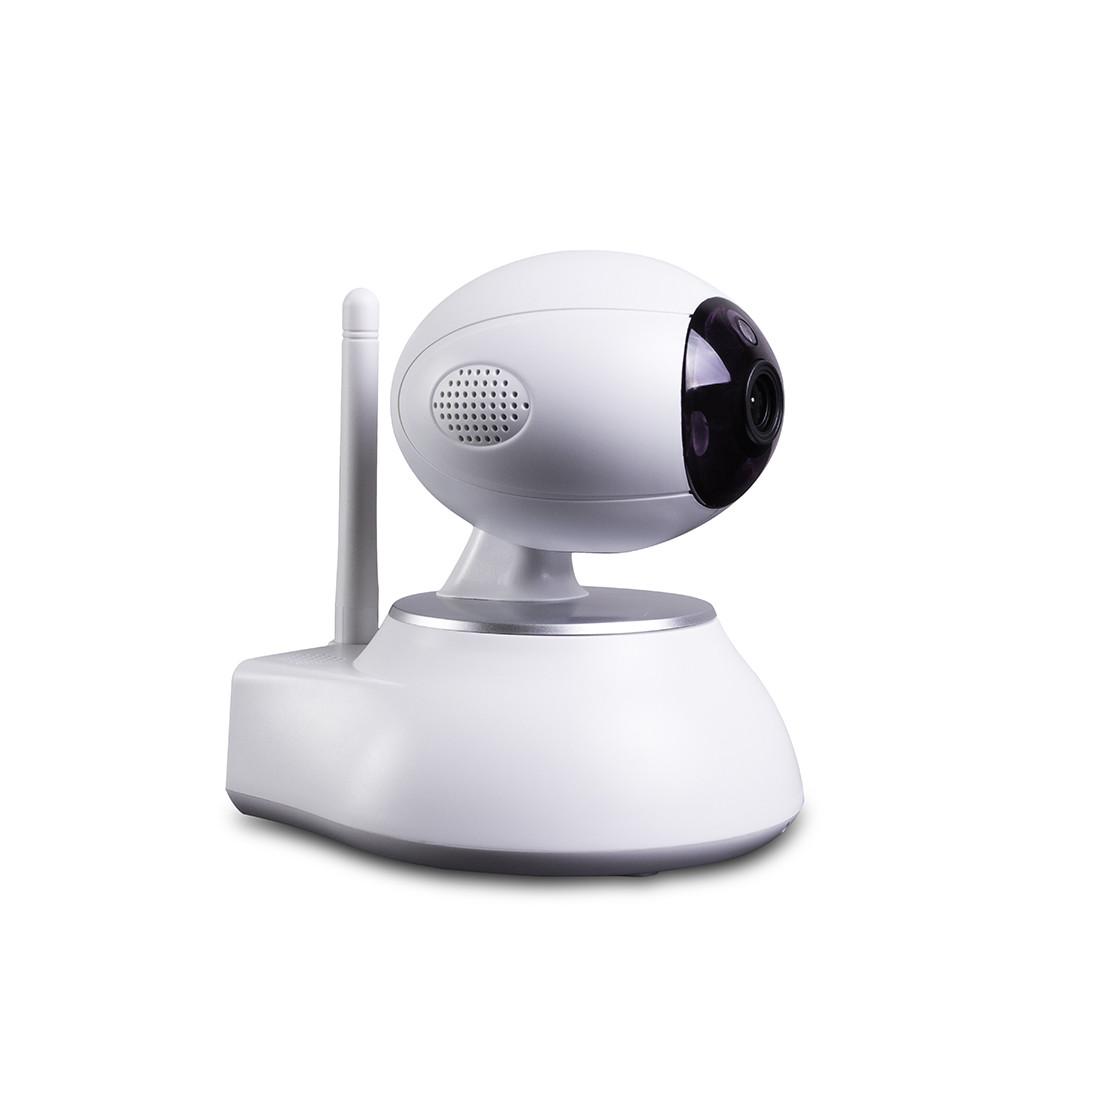 Беспроводная мини PTZ камера Patrol Hawk Vcam Wi-Fi HD